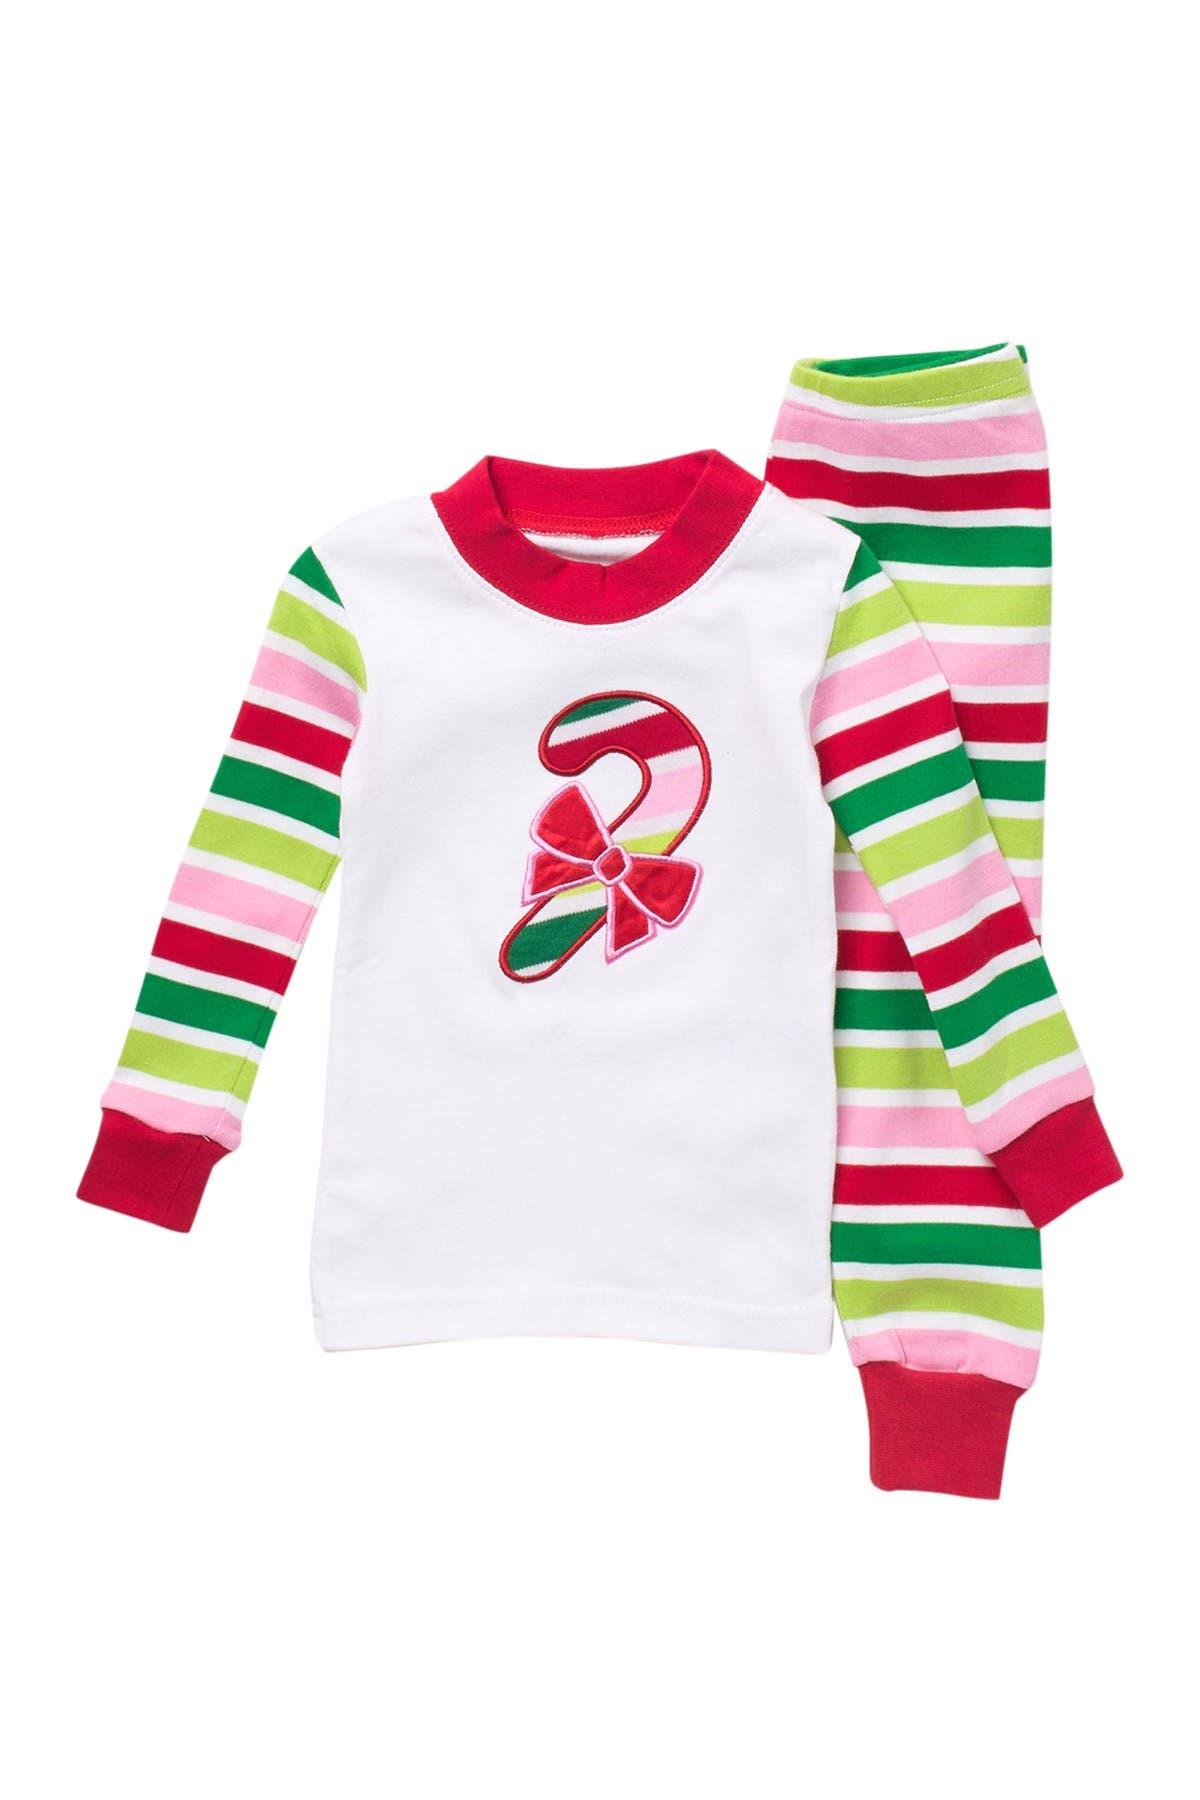 SARAS PRINTS Long John Christmas Pajamas